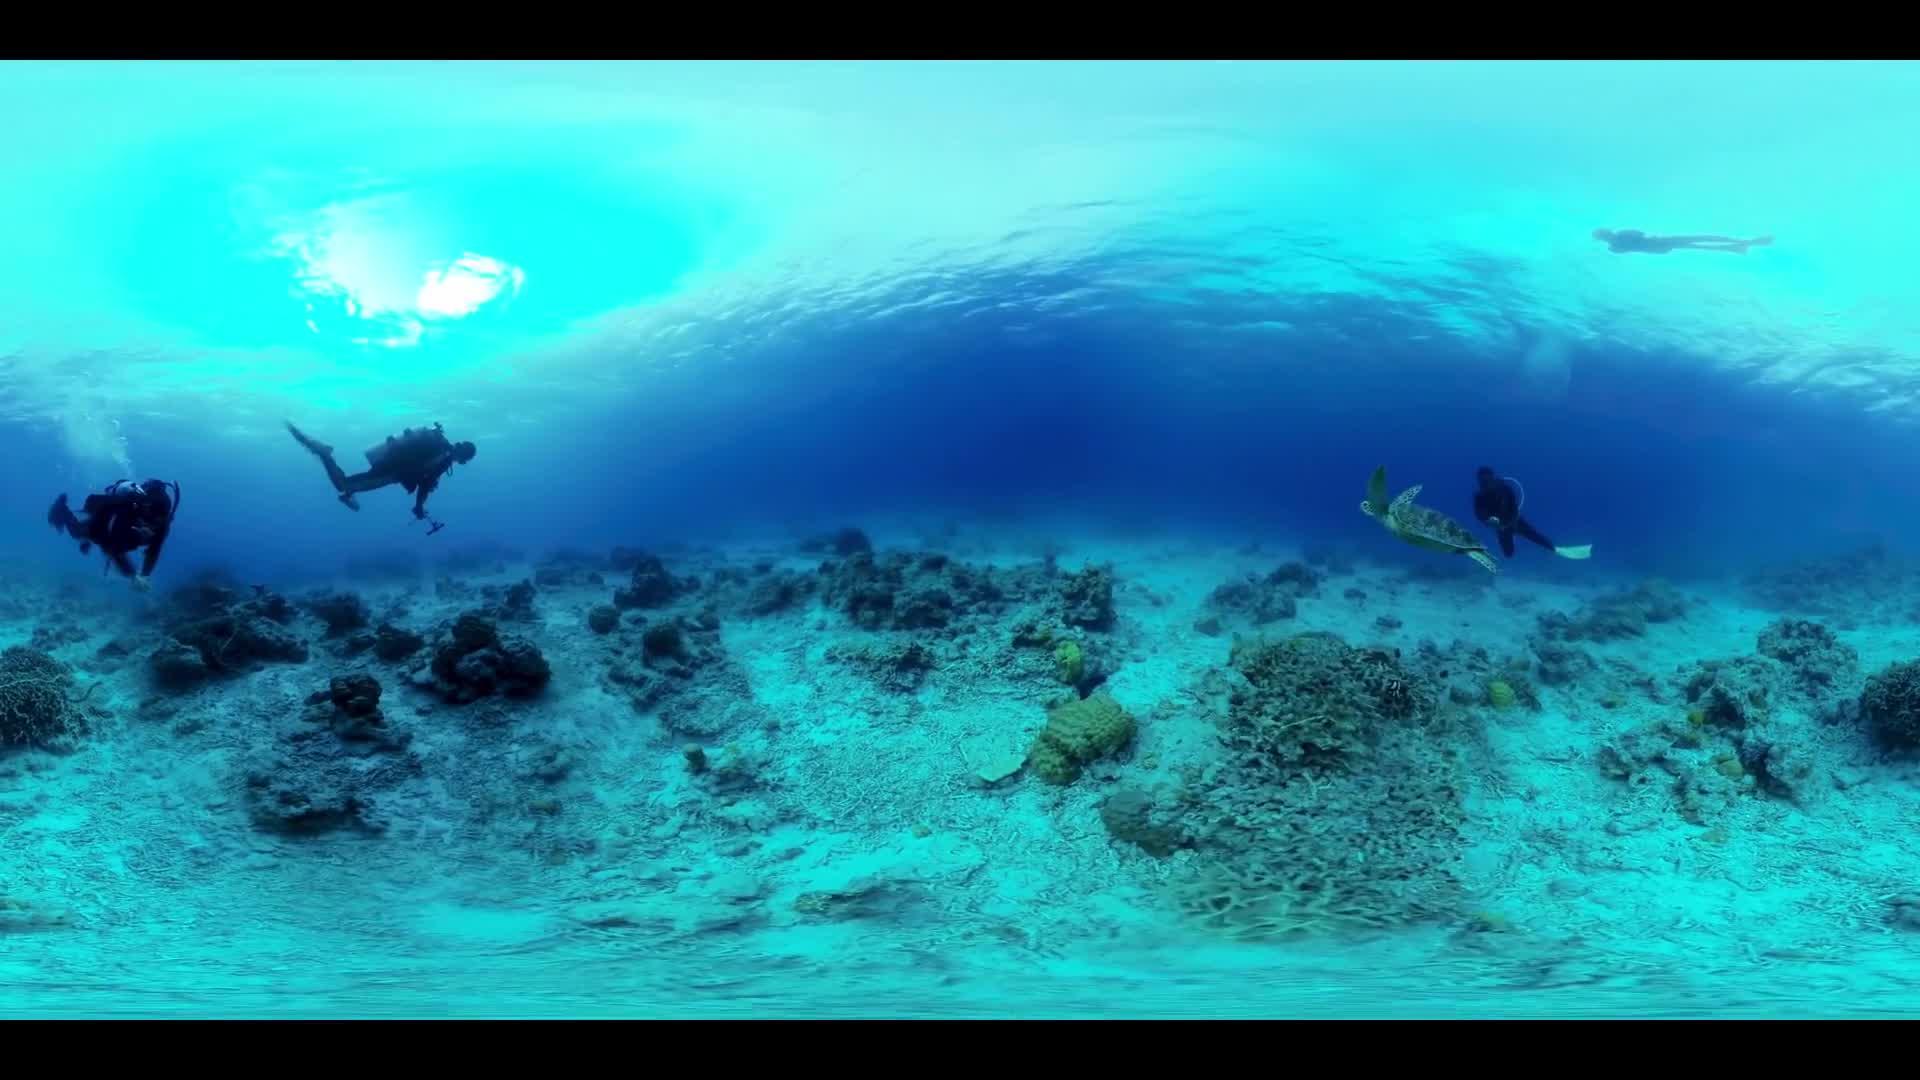 Gili Meno Turtles Underwater 360 VR